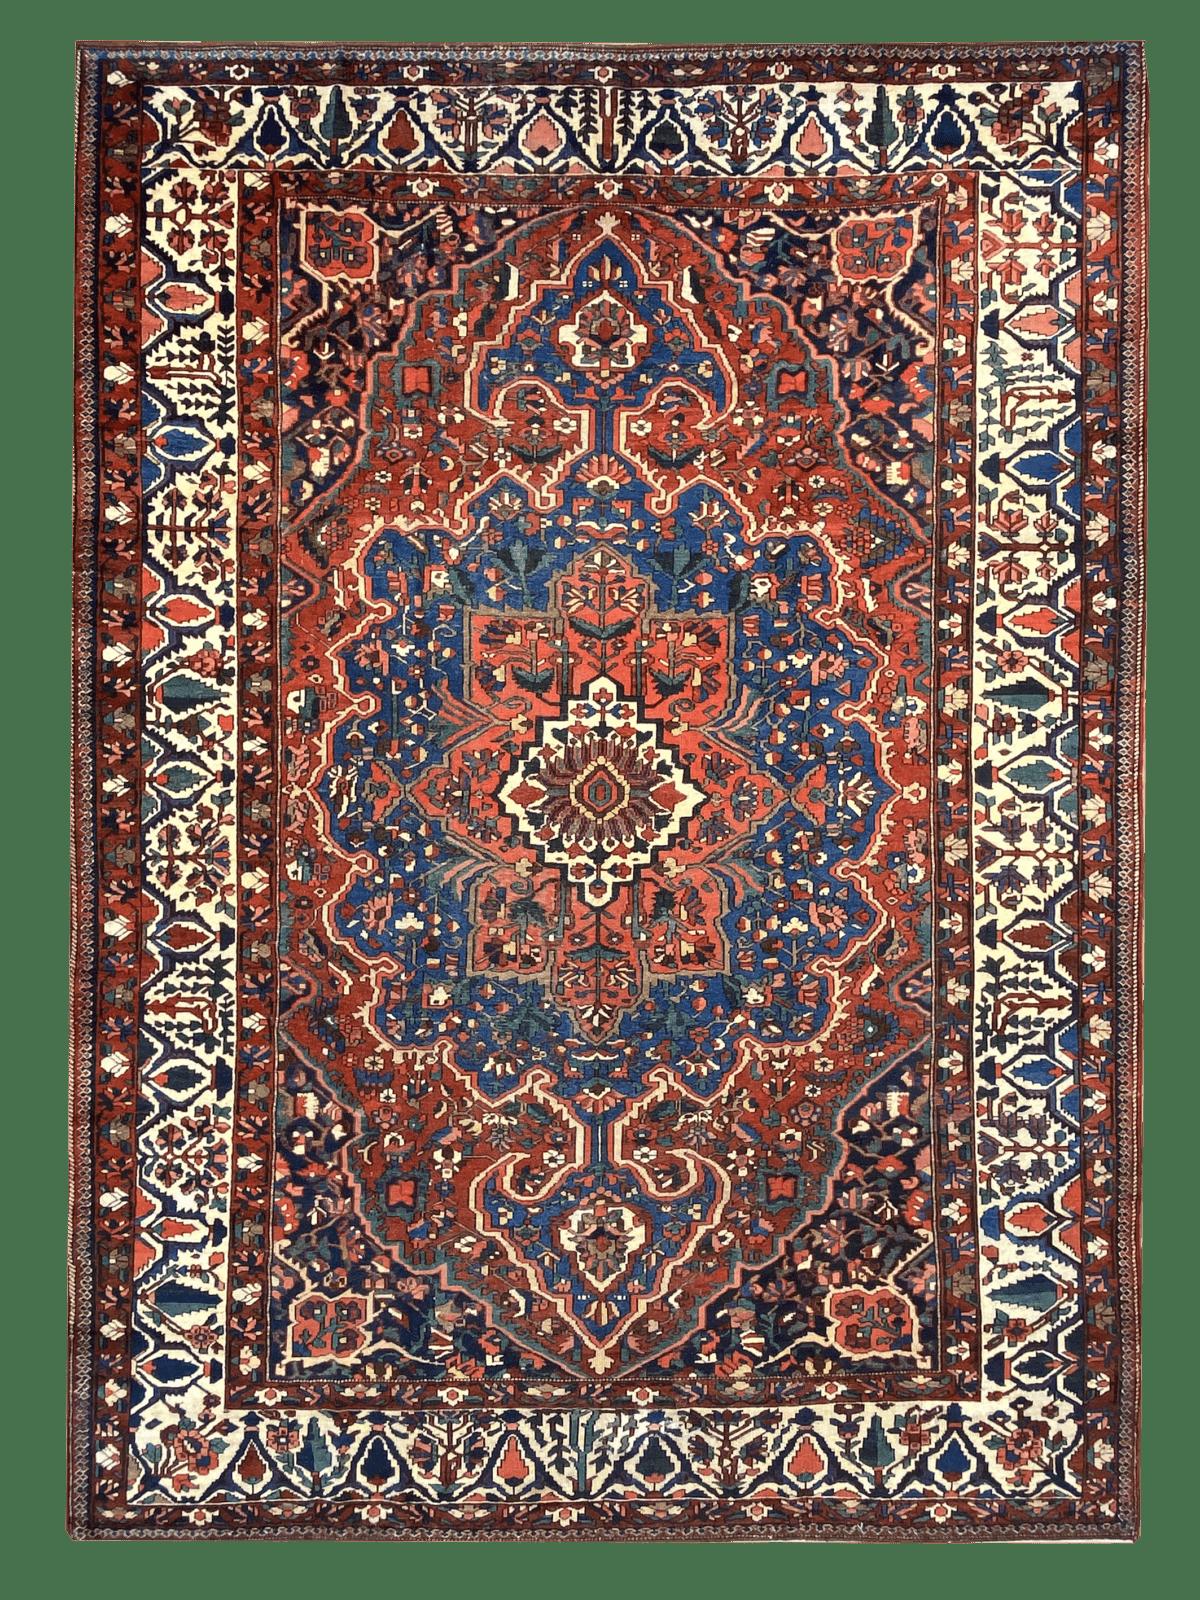 "Antique Persian Bakhtiari 10' 3"" x 14' Handmade Area Rug - Shabahang Royal Carpet"